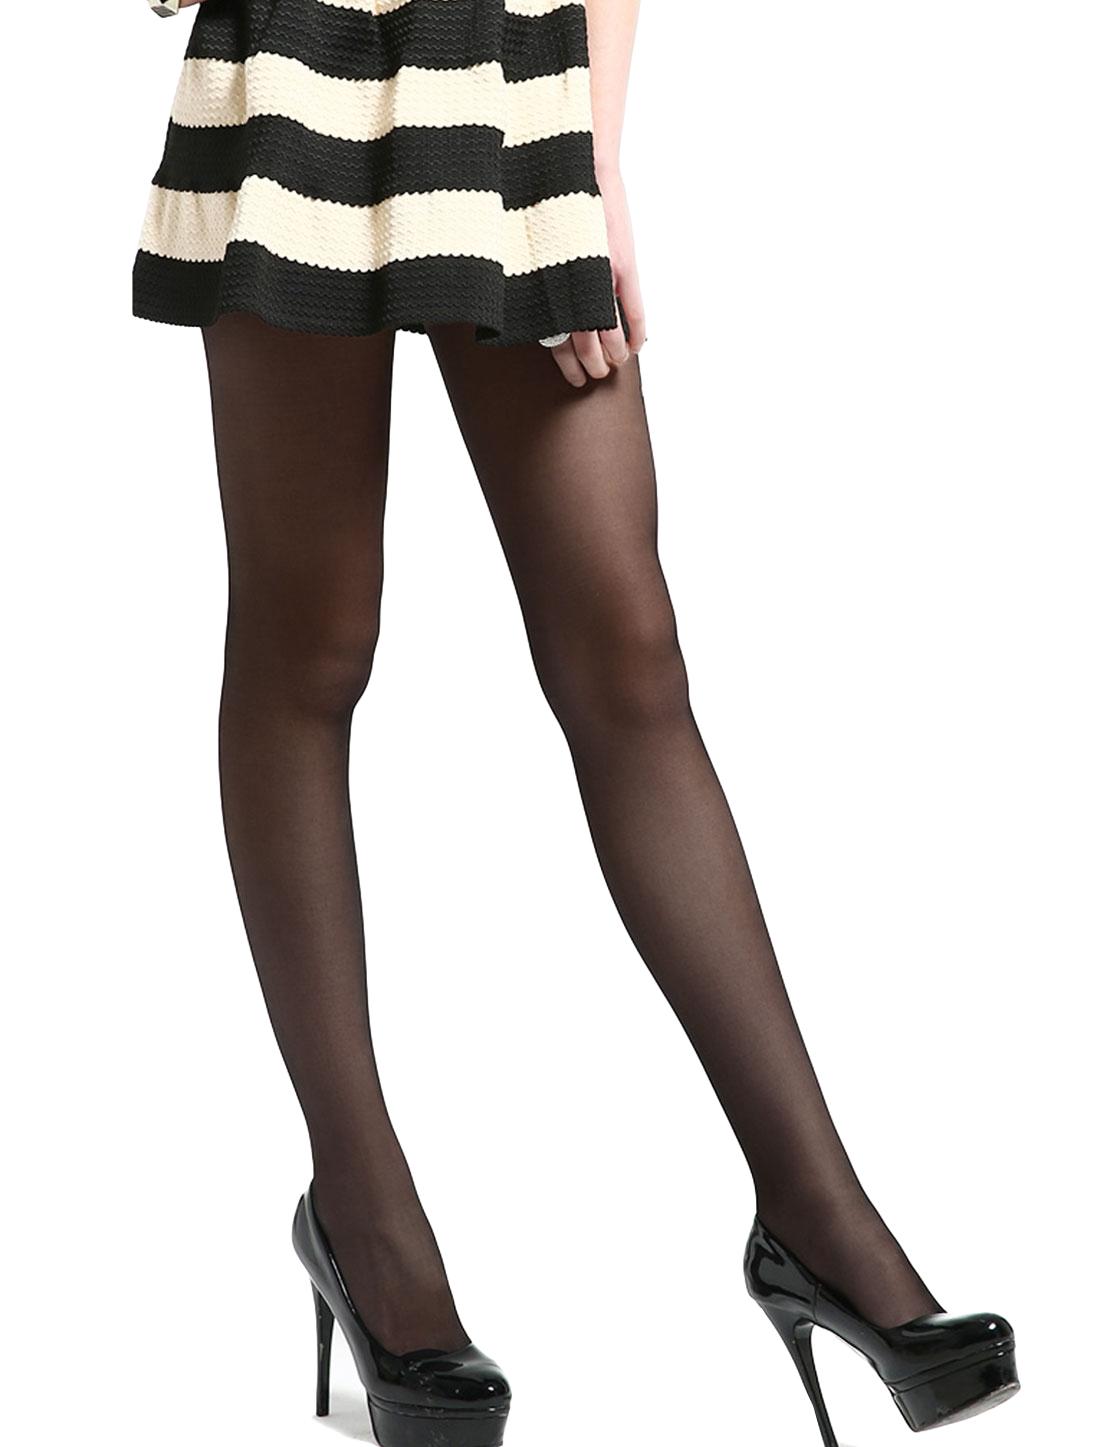 Women Control Top Sheer Stretchy Waist Leggings Pantyhose Black L